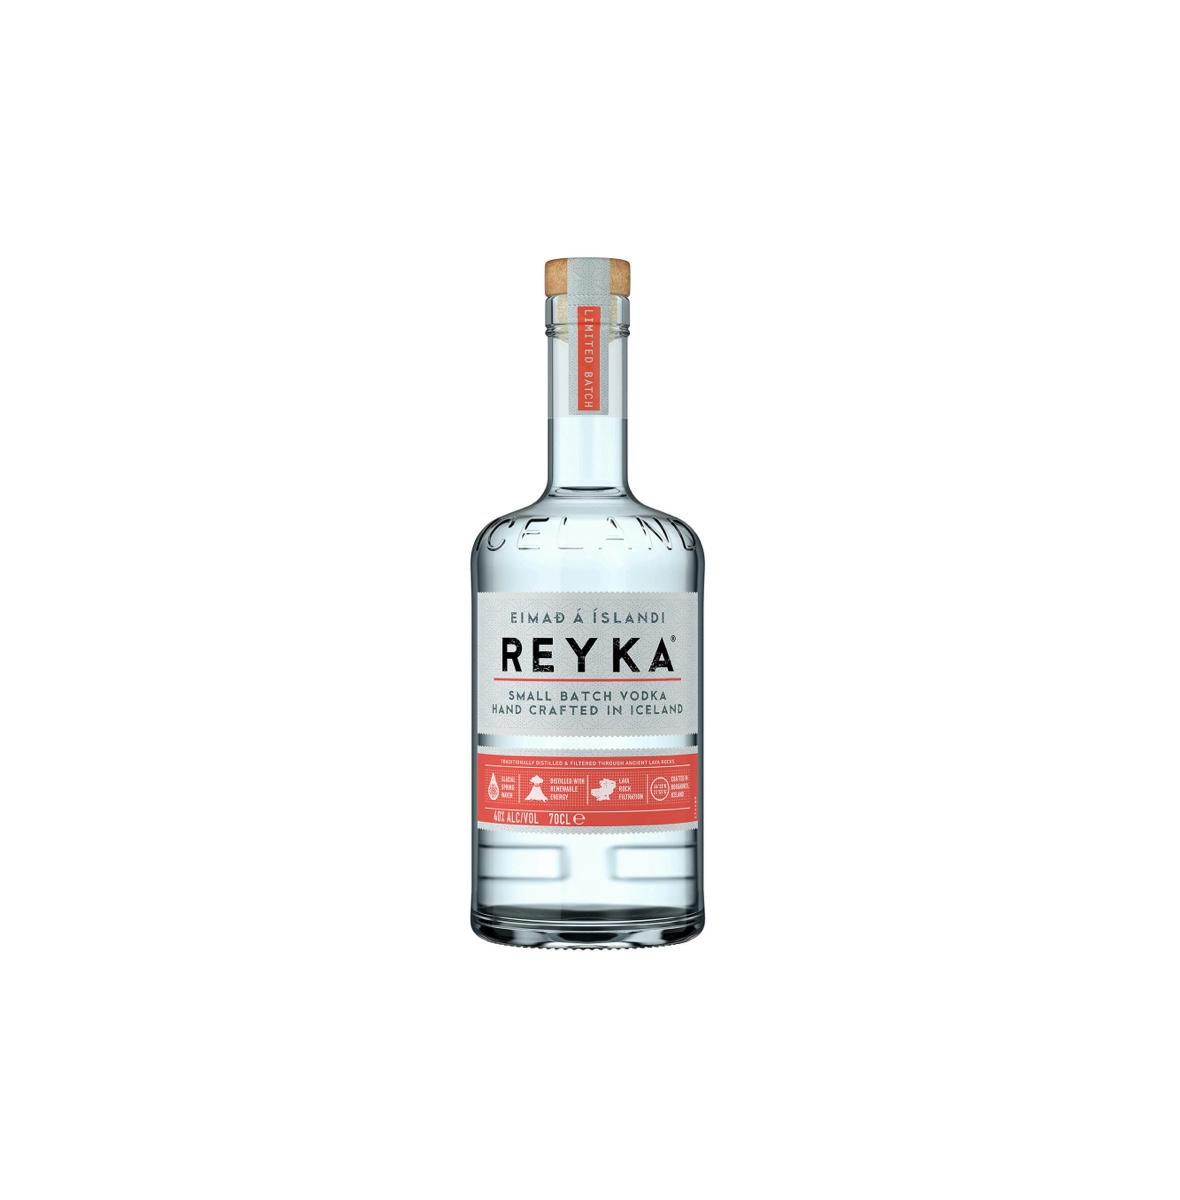 Discover Reyka